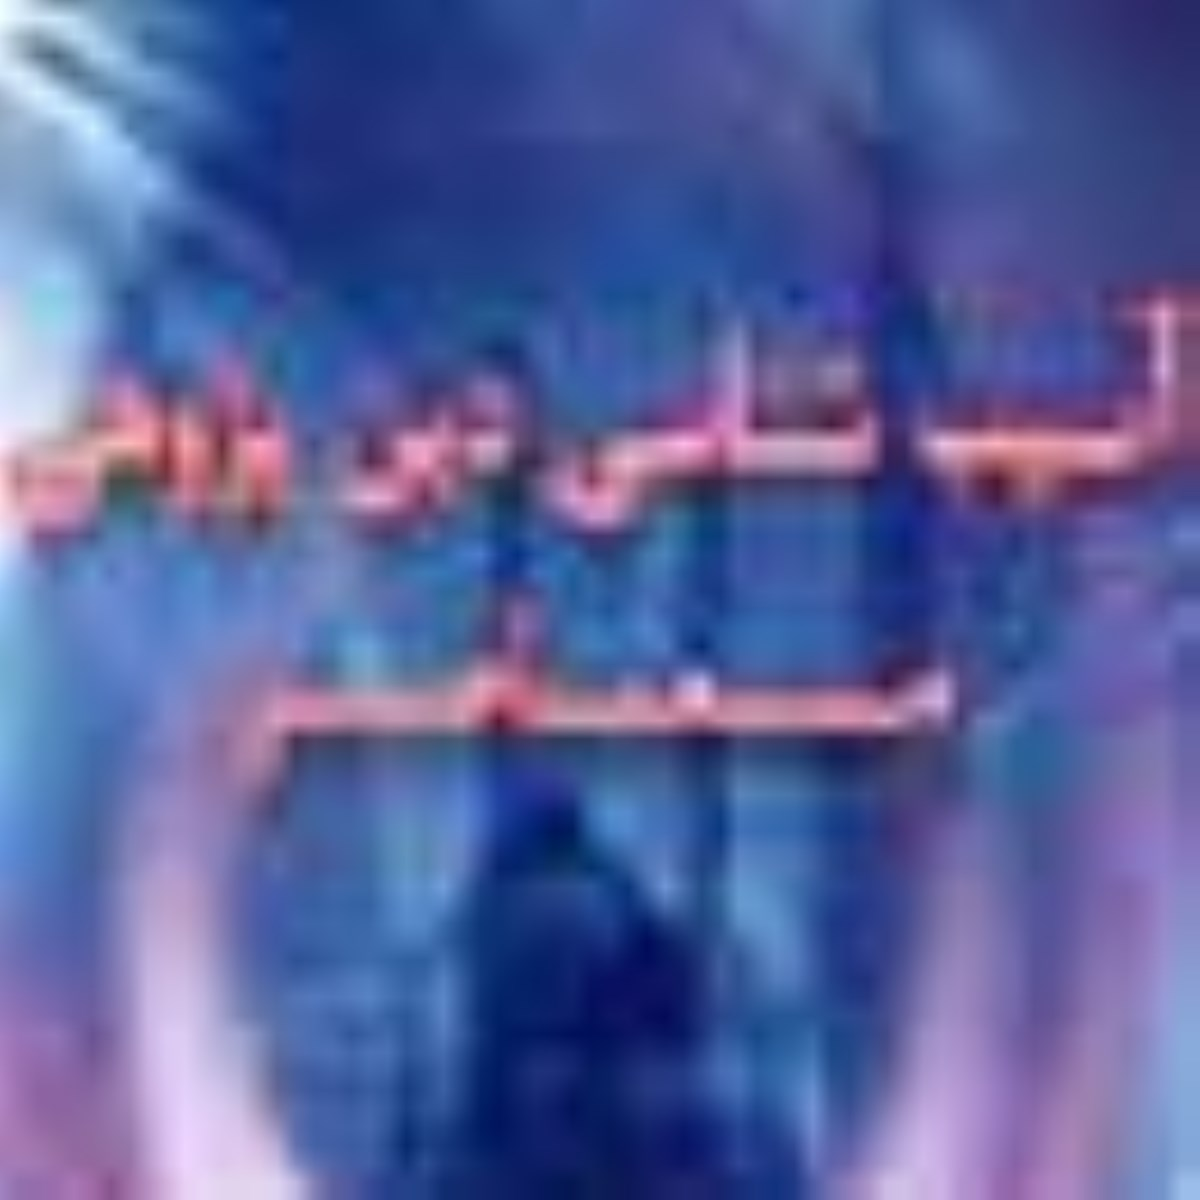 آسيب شناسي دين پژوهي معاصر